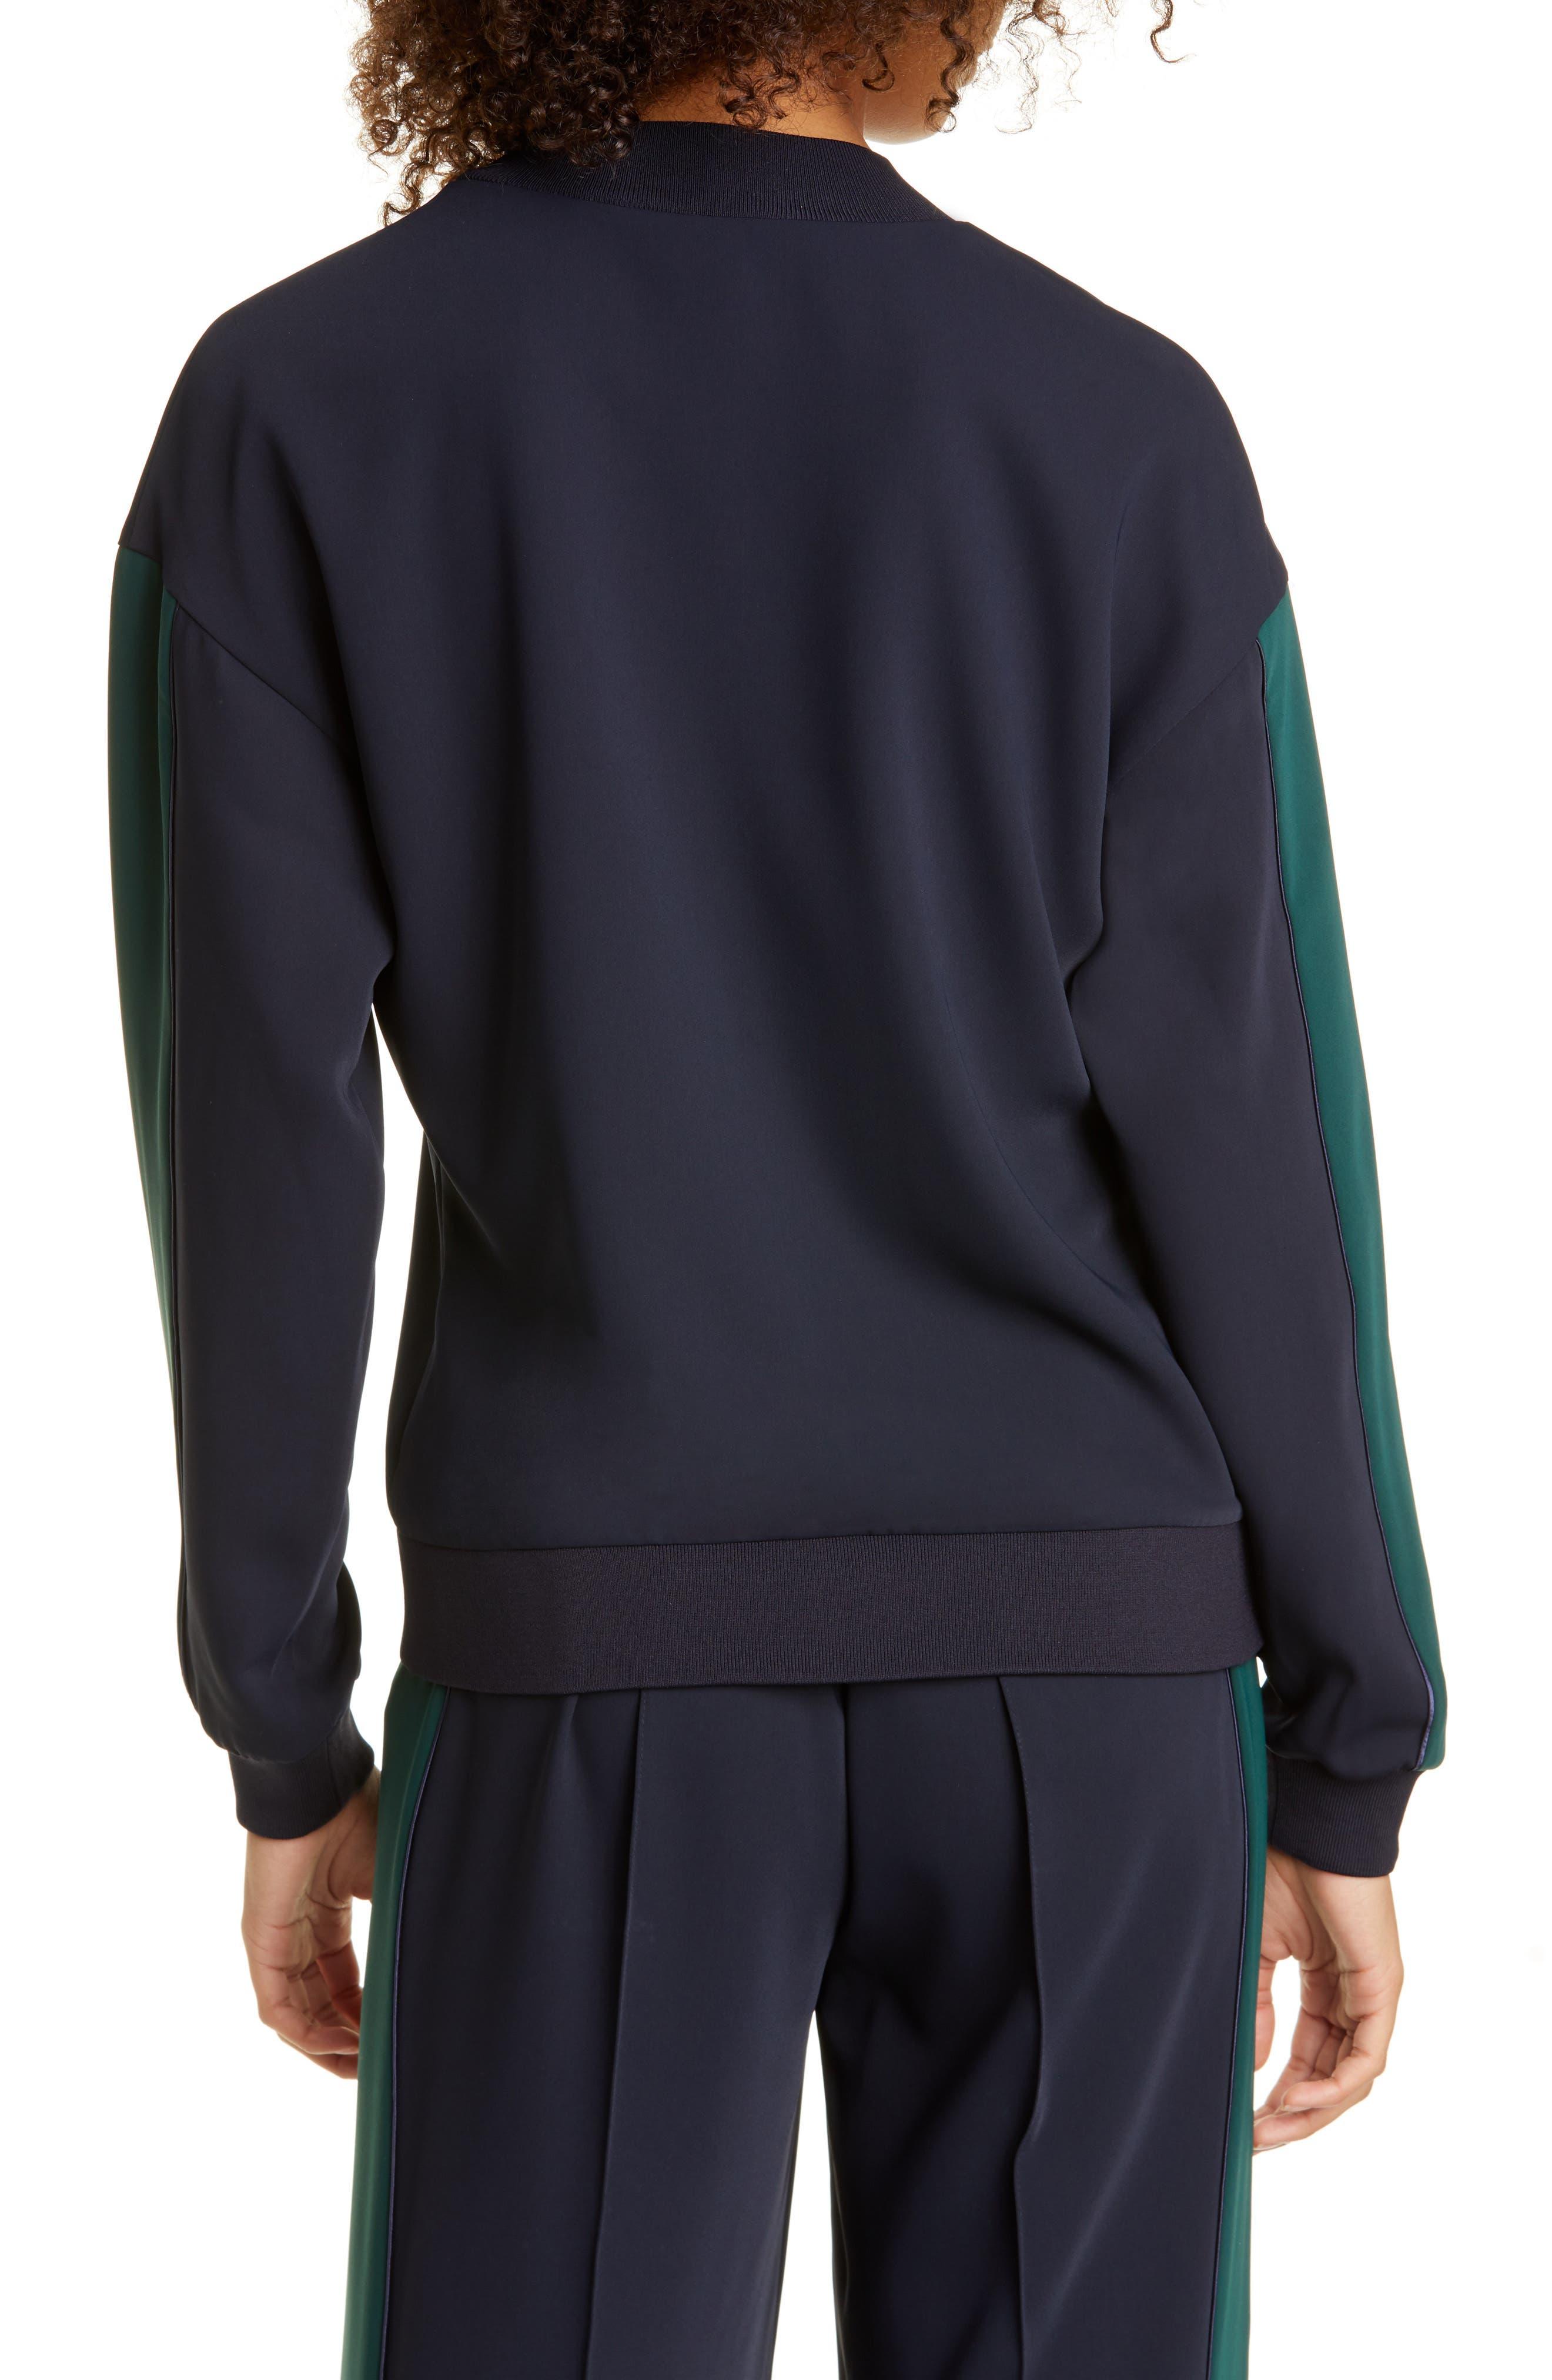 ADIDAS SATIN HOODIE NAVY & YELLOW striped pullover Depop